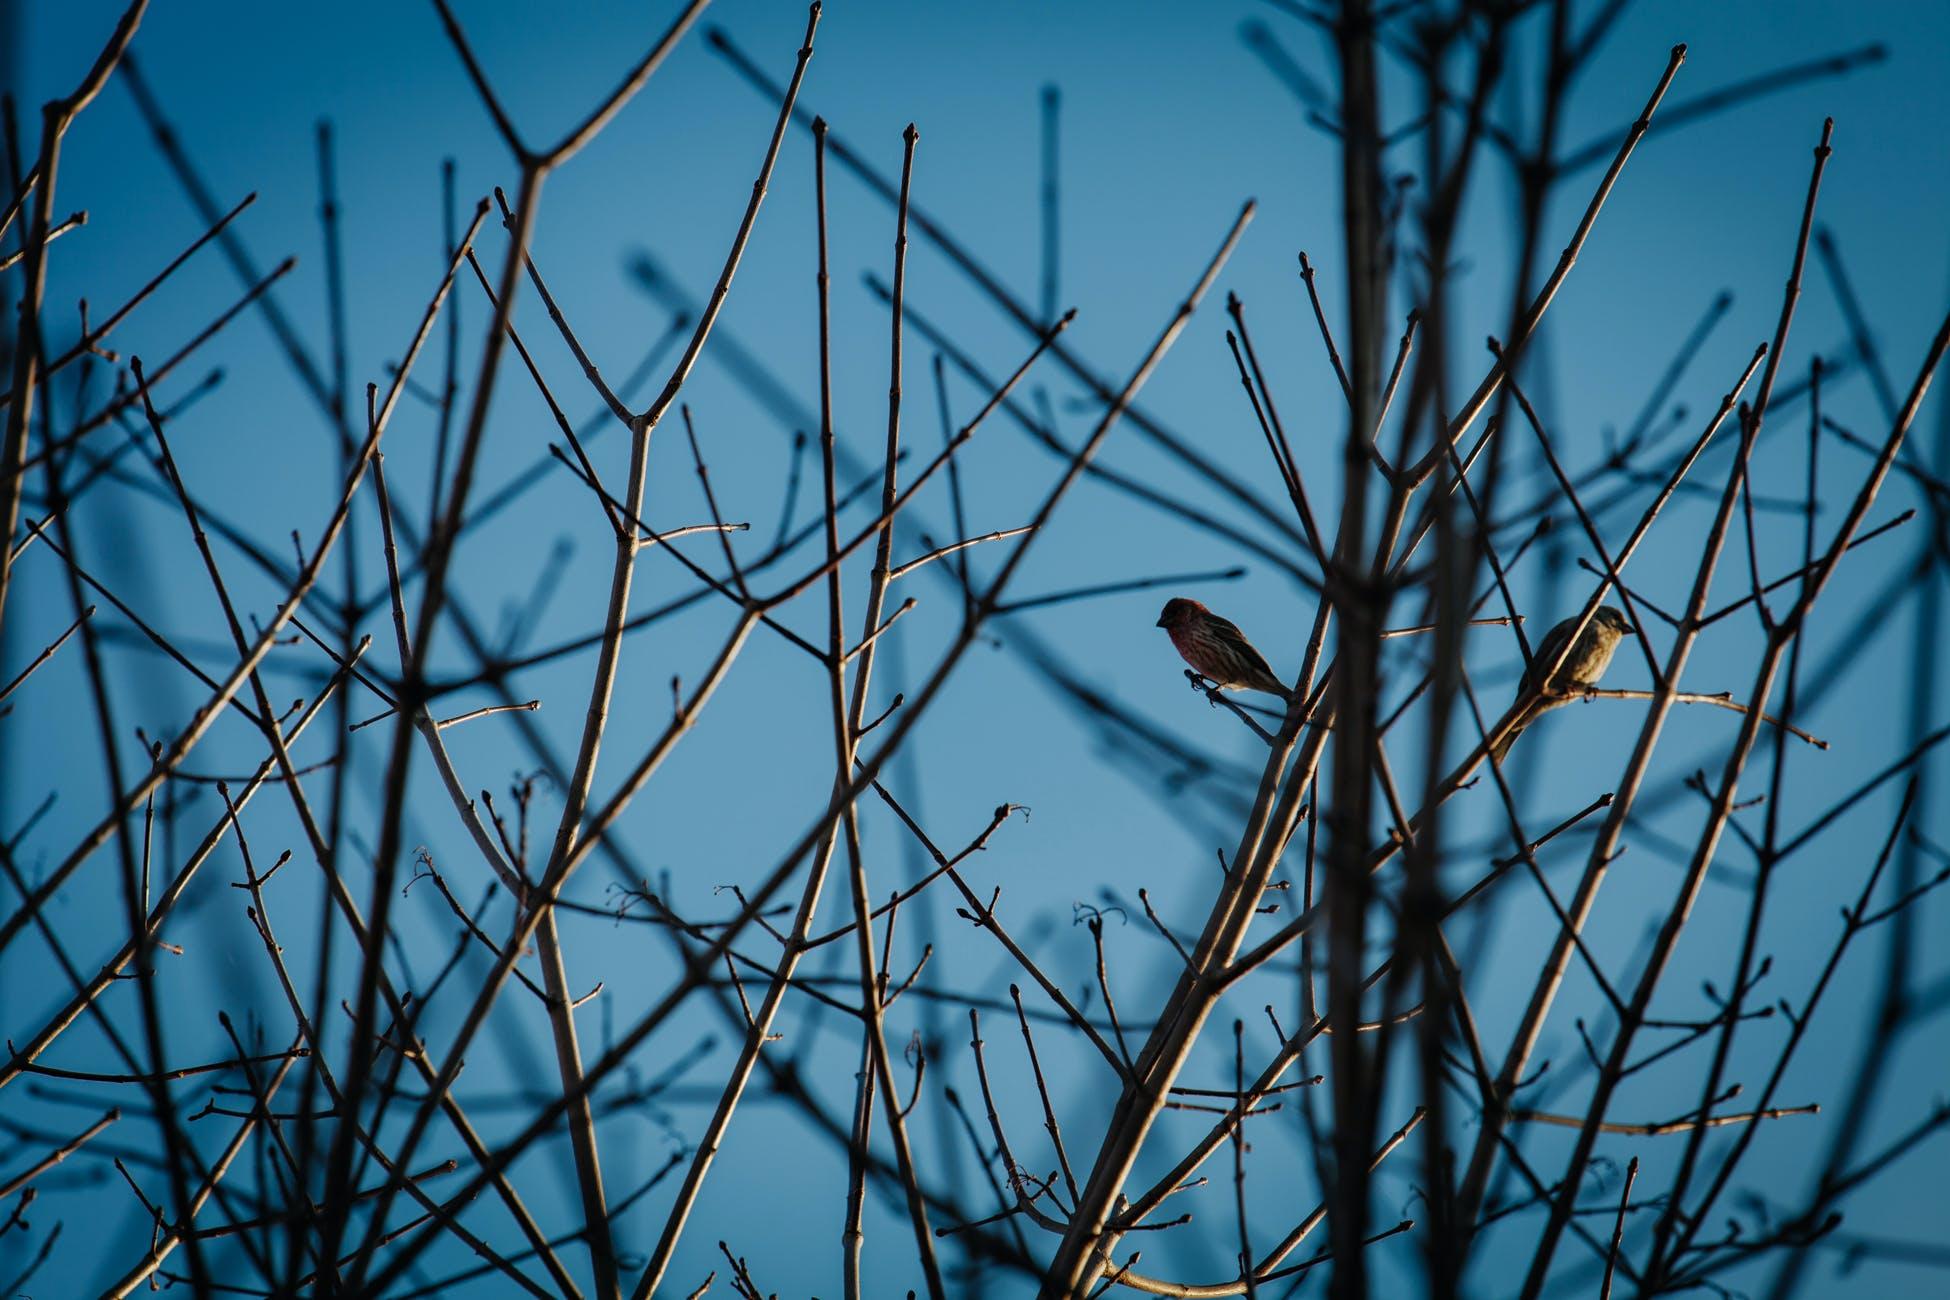 Free stock photo of nature, bird, tree, outdoors